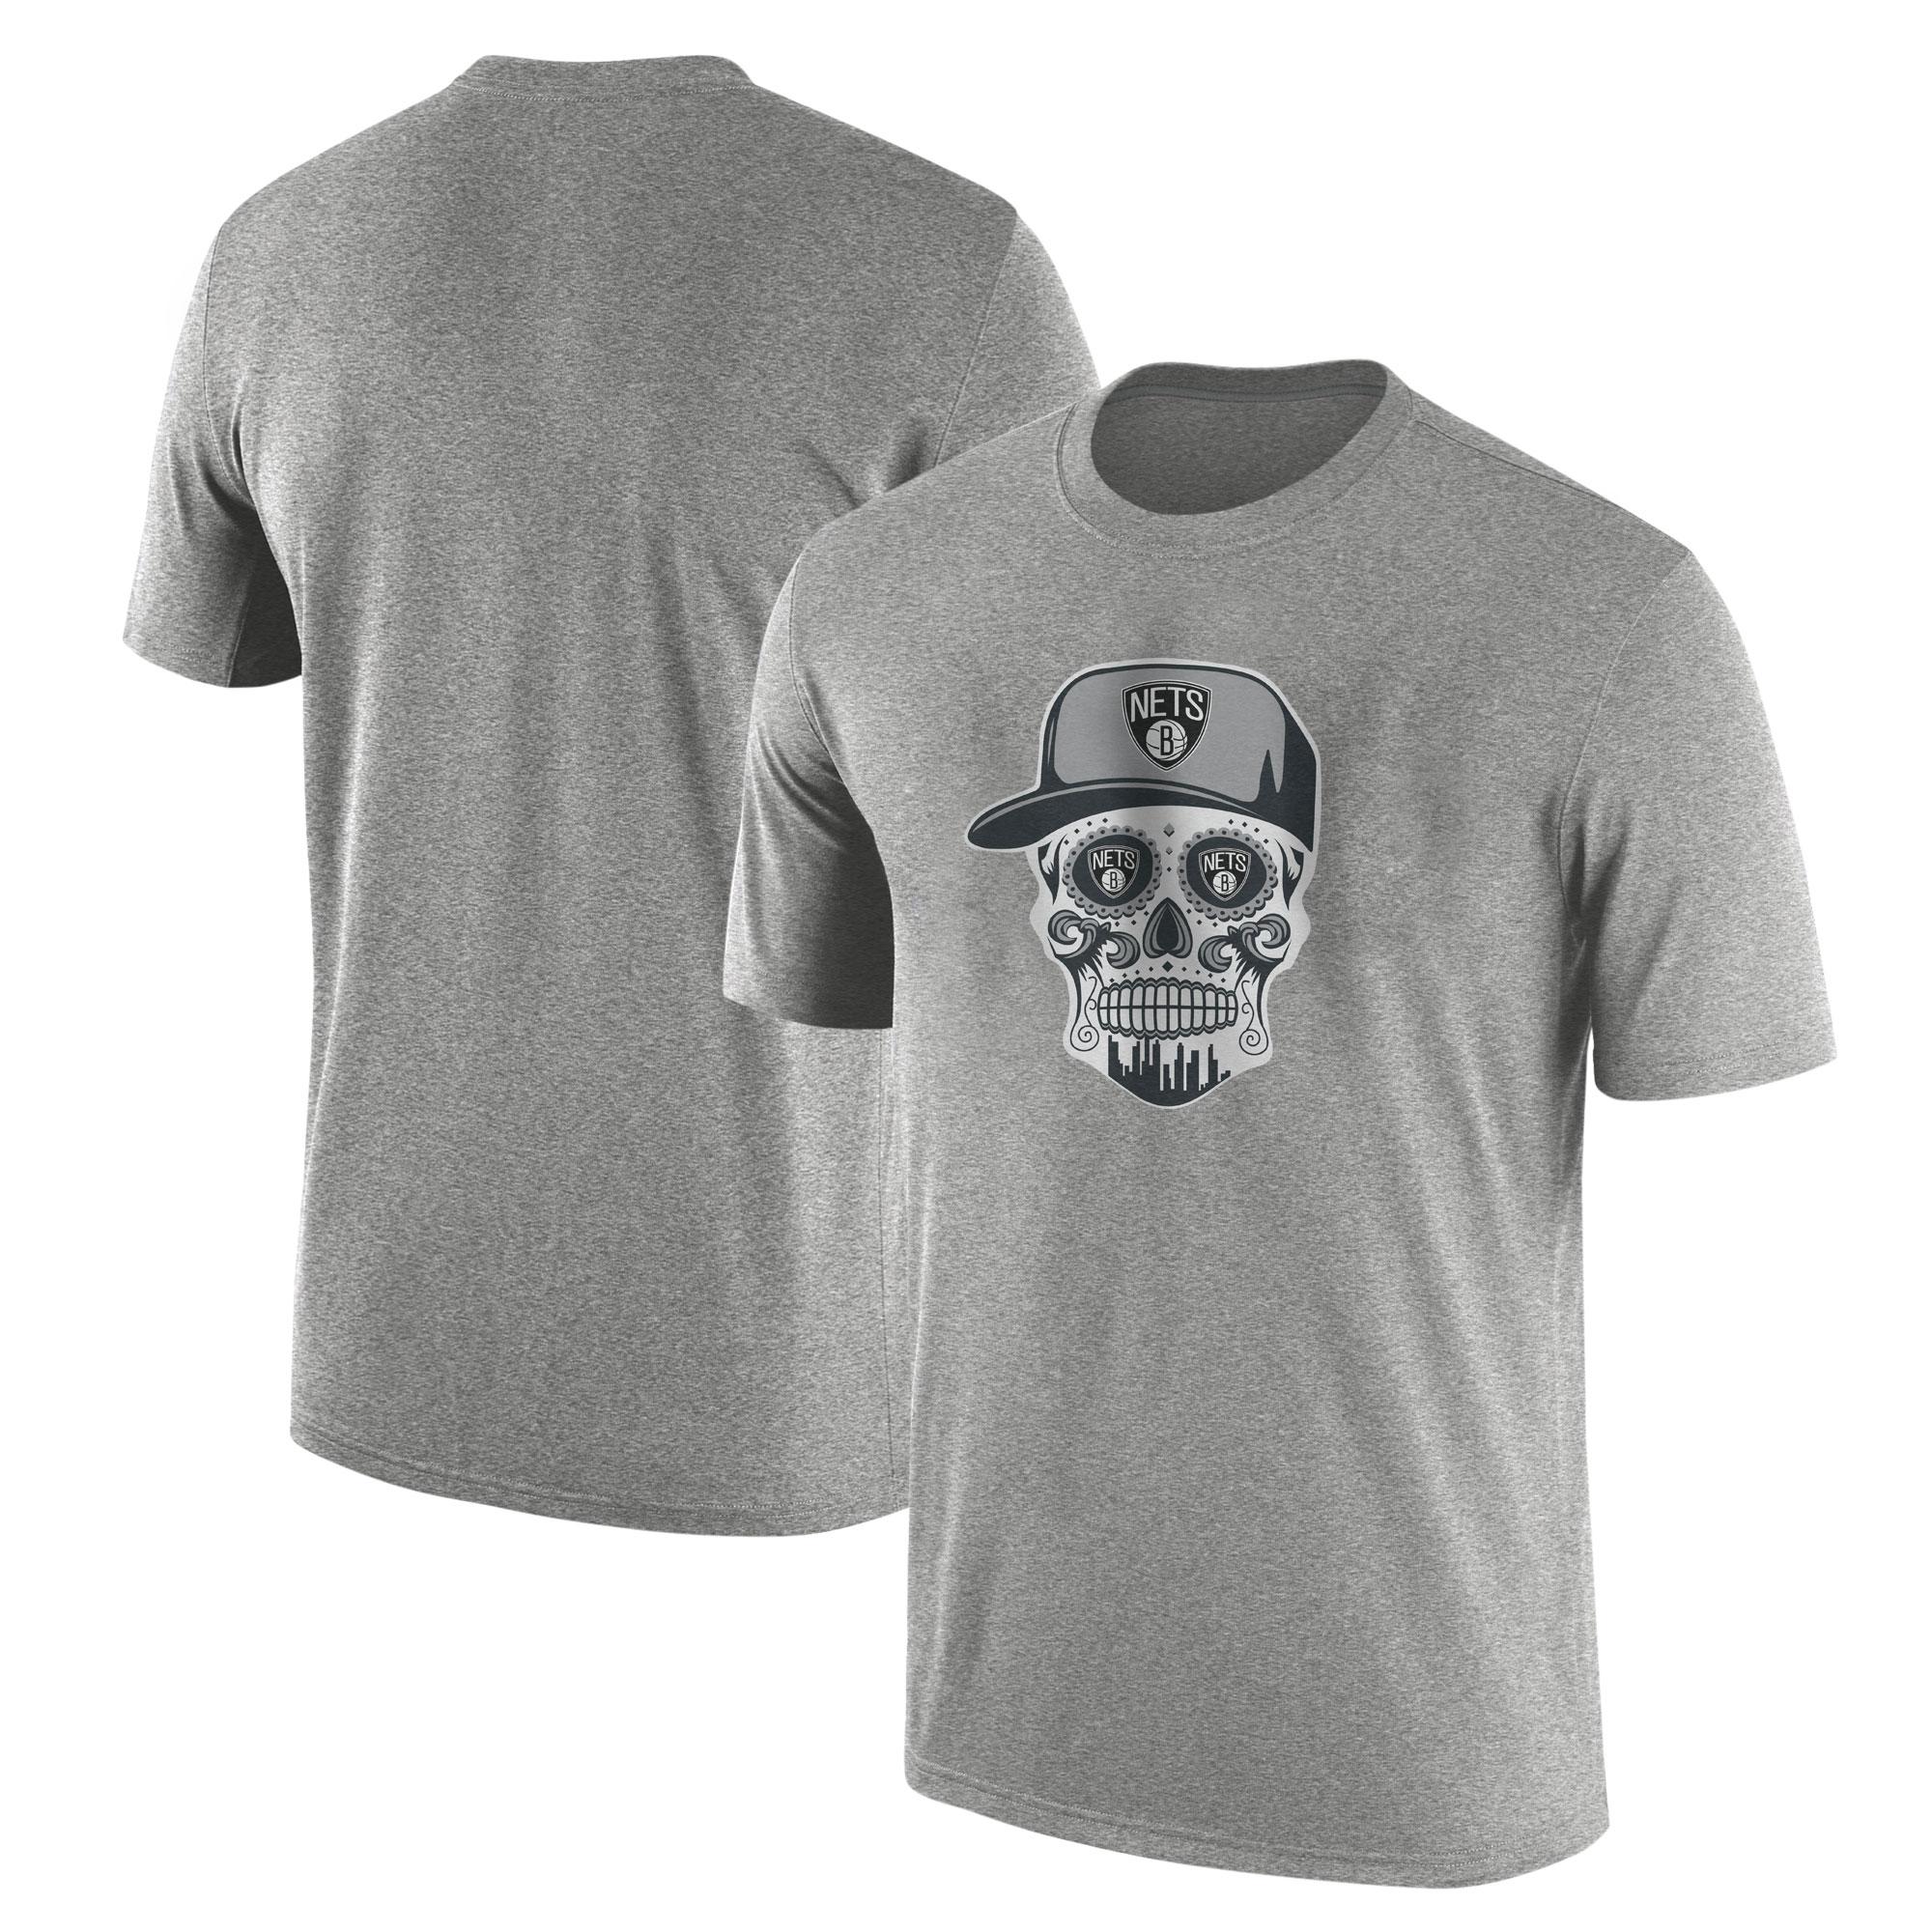 Brooklyn Skull  Tshirt (TSH-GRY-NP-445-NBA-BRO-SKULL)